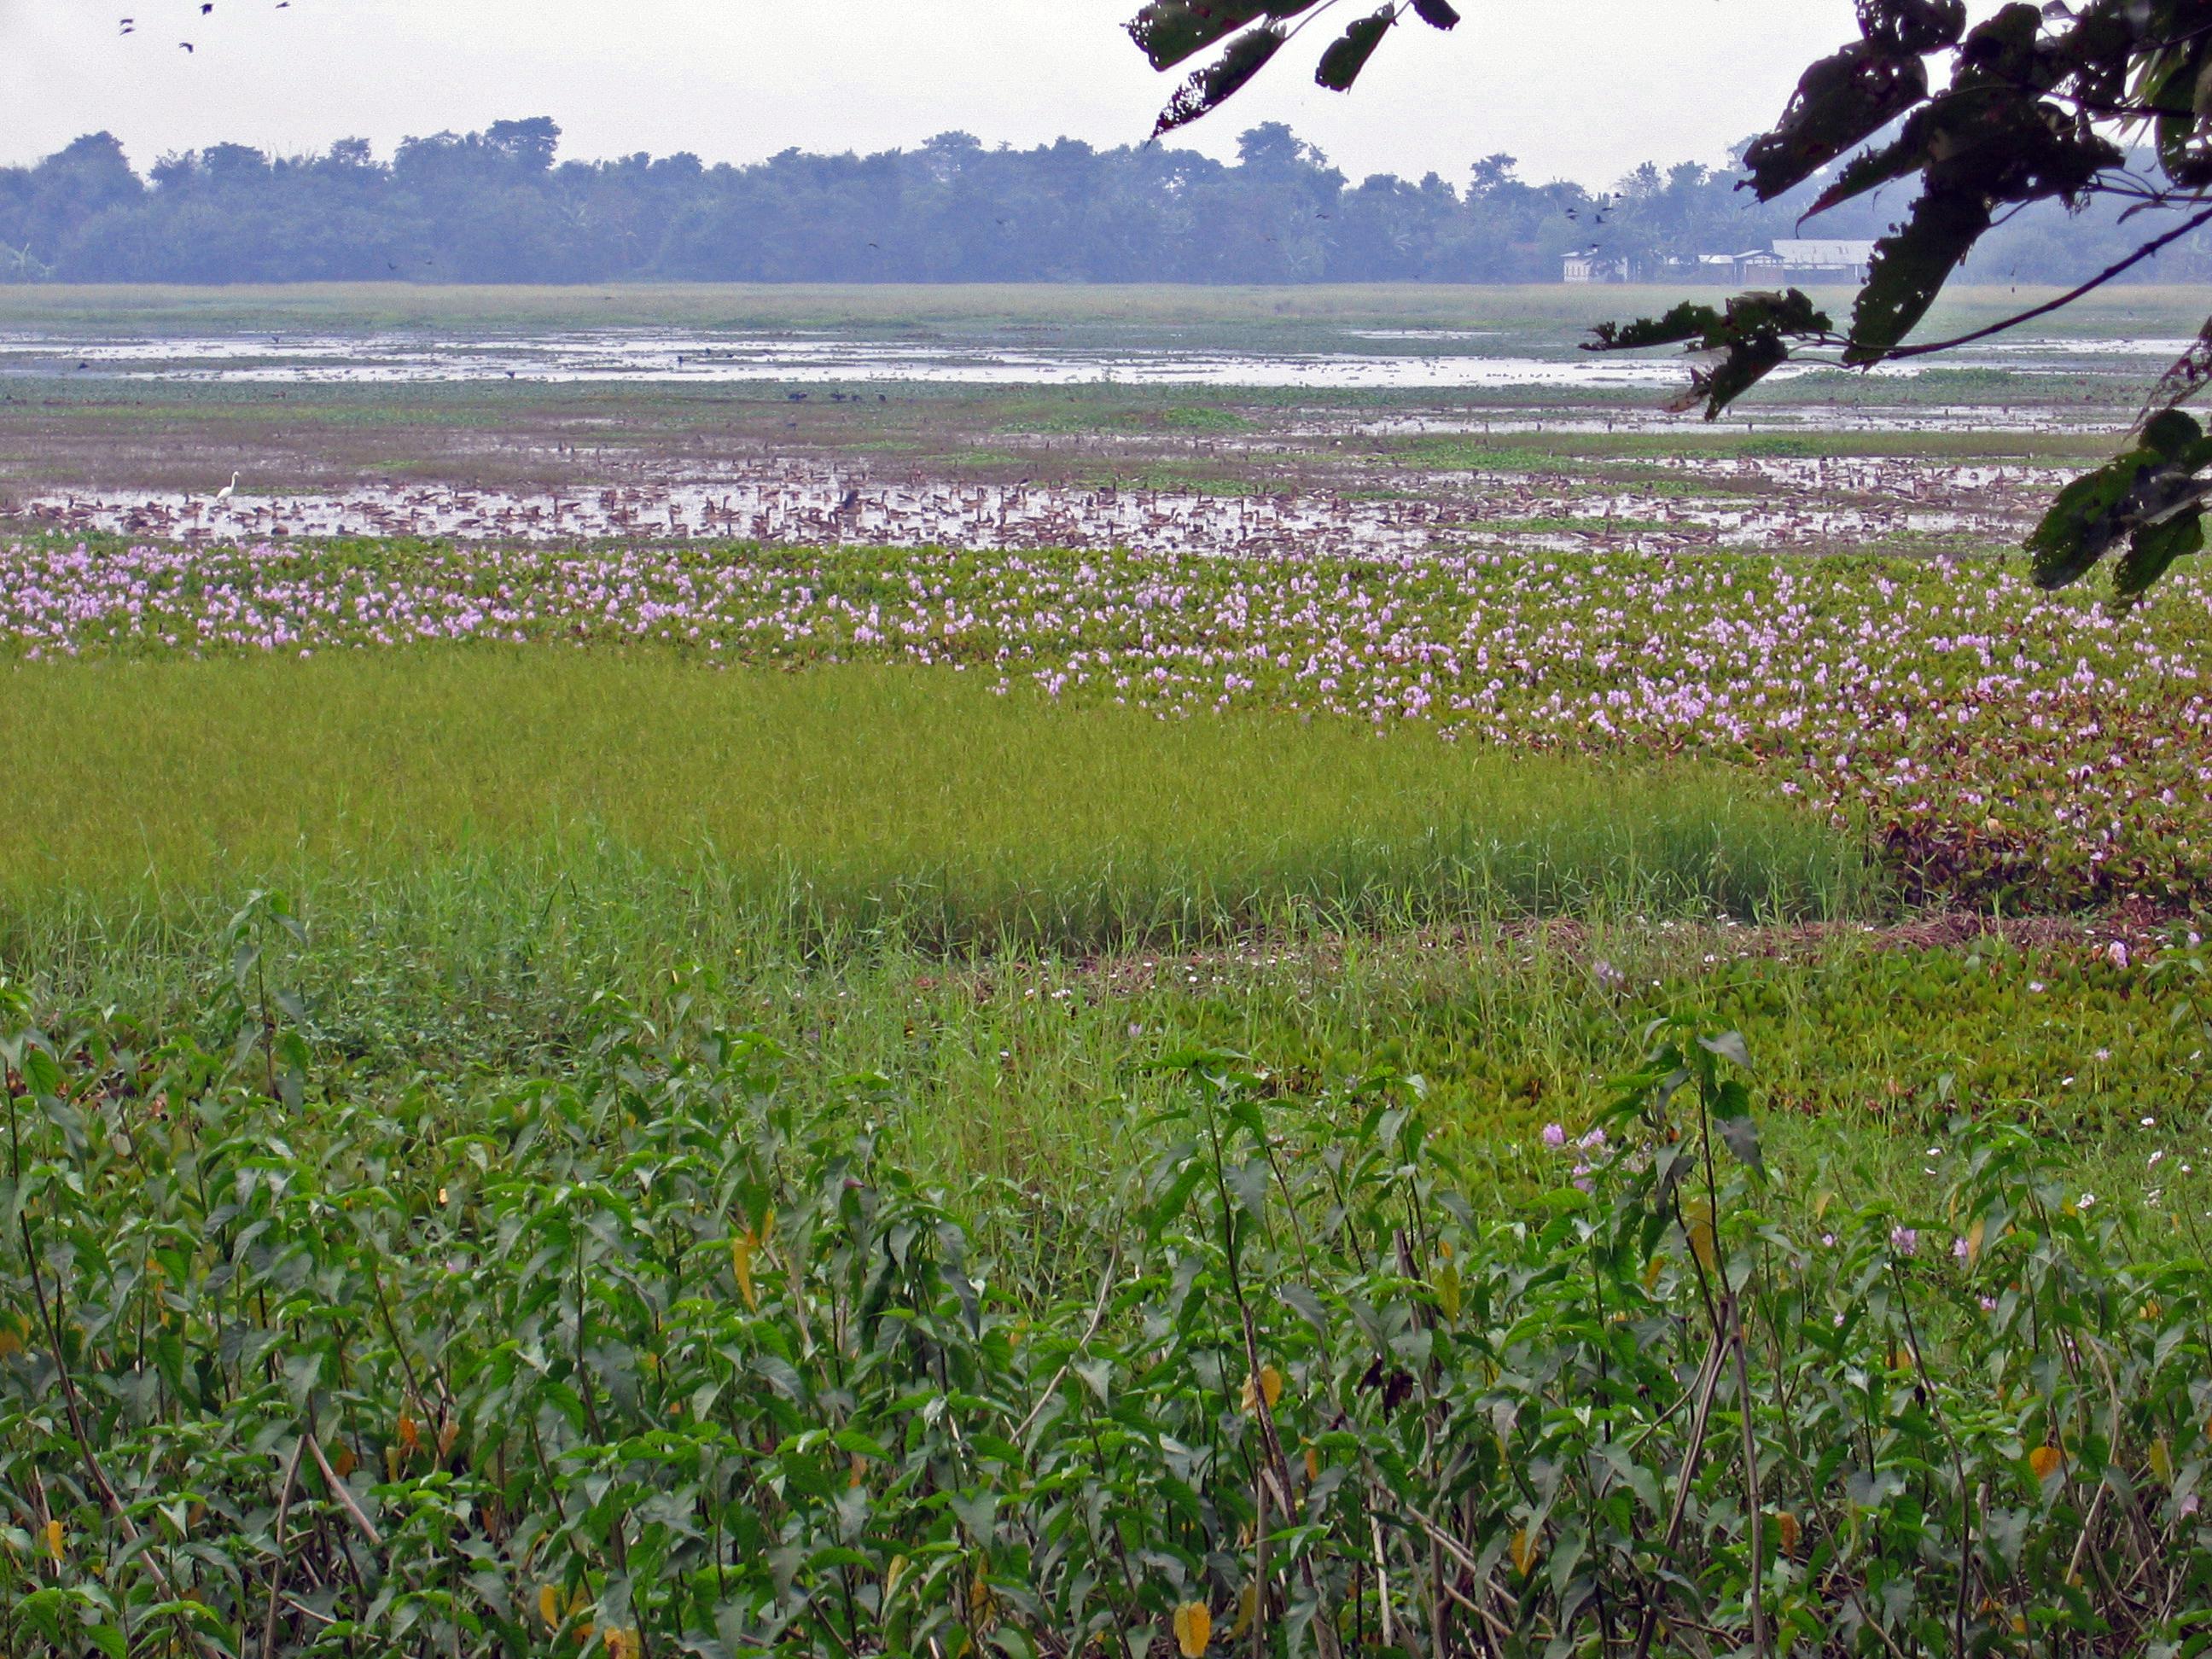 One of the wetlands of Majuli